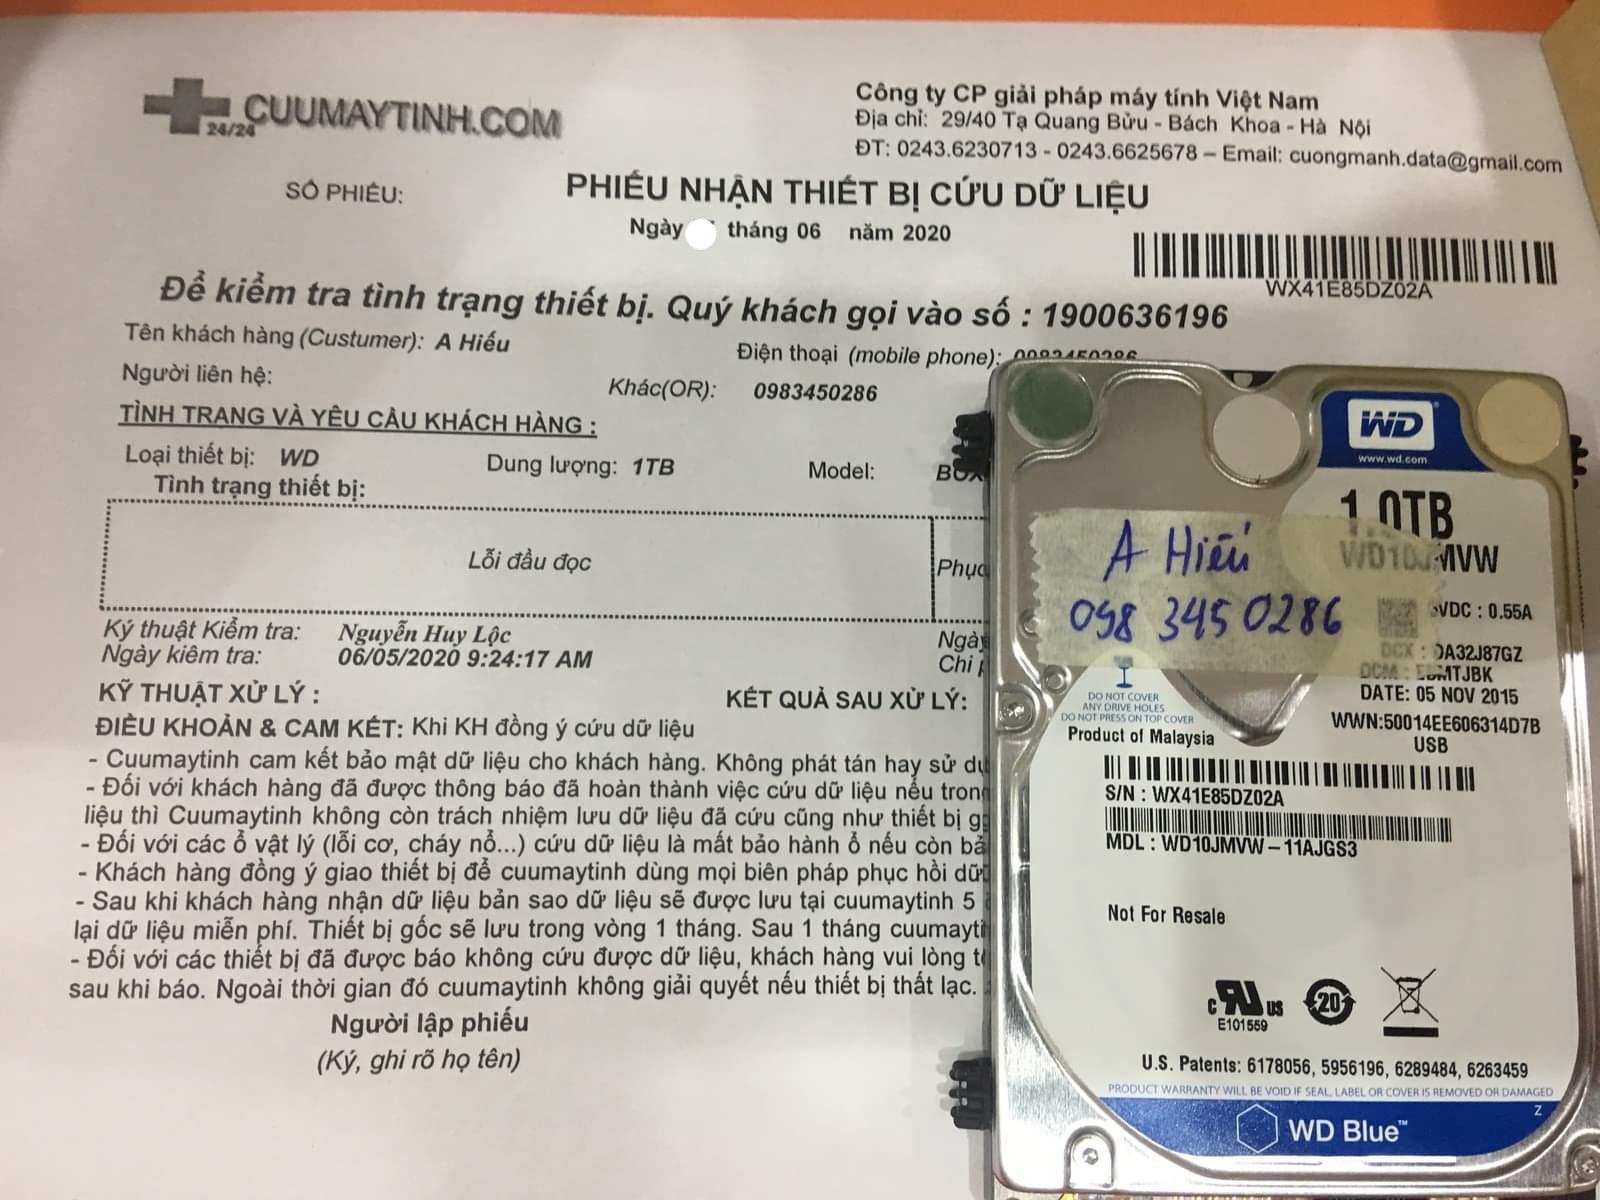 Lấy dữ liệu ổ cứng Western 1TB lỗi đầu đọc 10/06/2020 - cuumaytinh